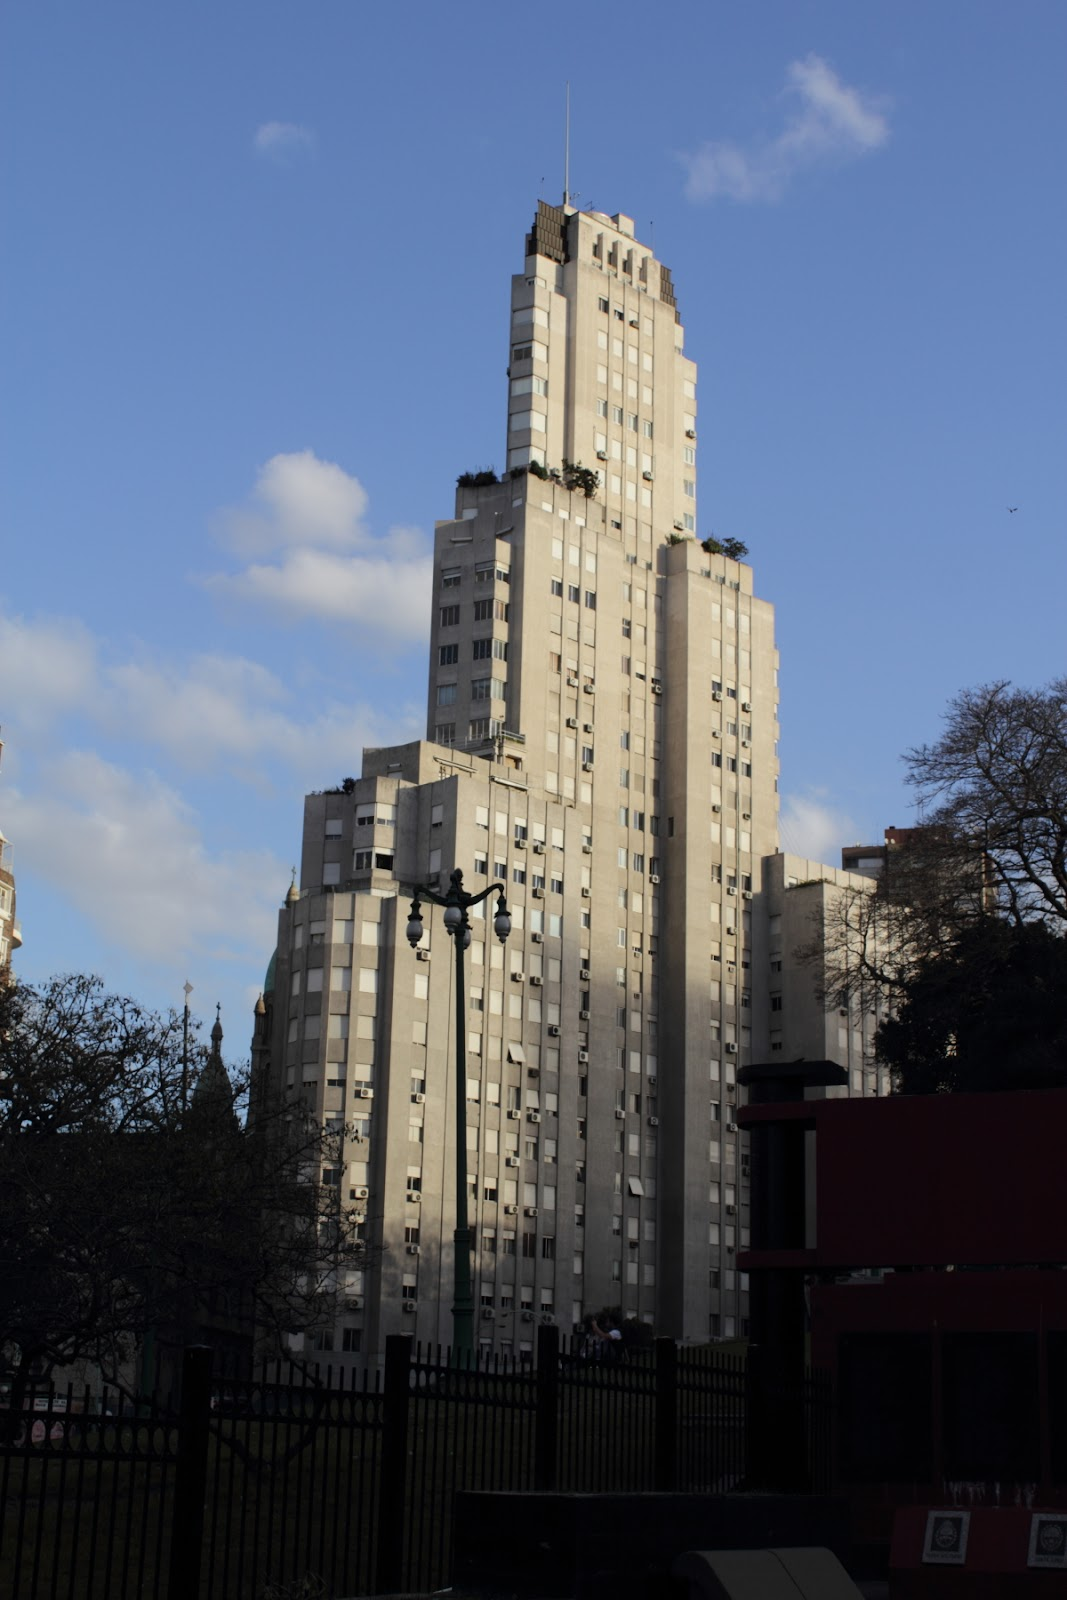 Edificio Kavanagh (The Kavanagh Building) - an Art Deco skyscraper in Buenos Aires overlooking Plaza San Martín.